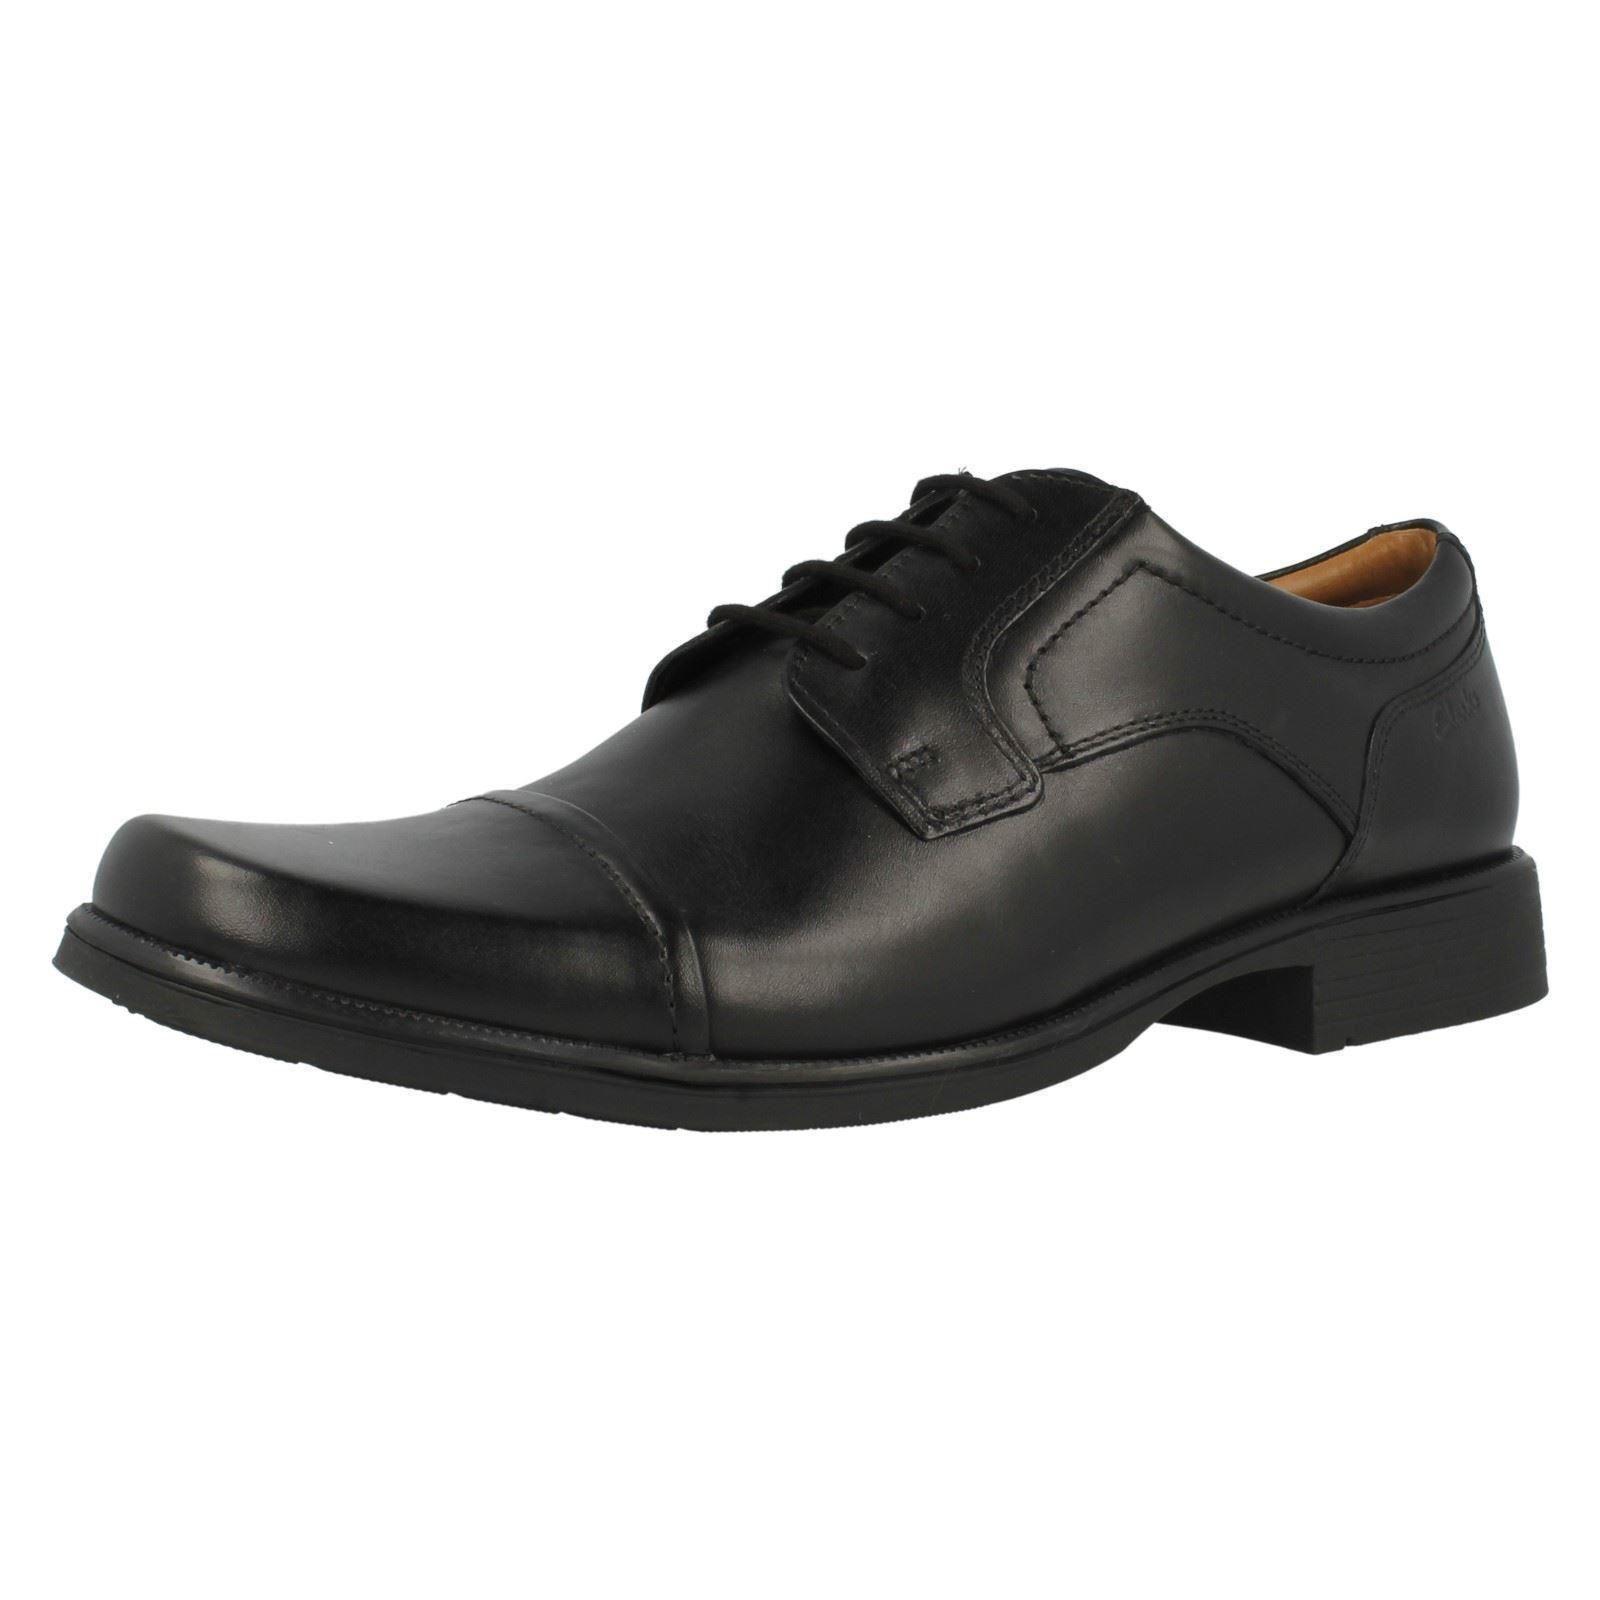 Herren Clarks Huckley Kappe Schwarzes Leder Elegant Oxford Schnürschuhe